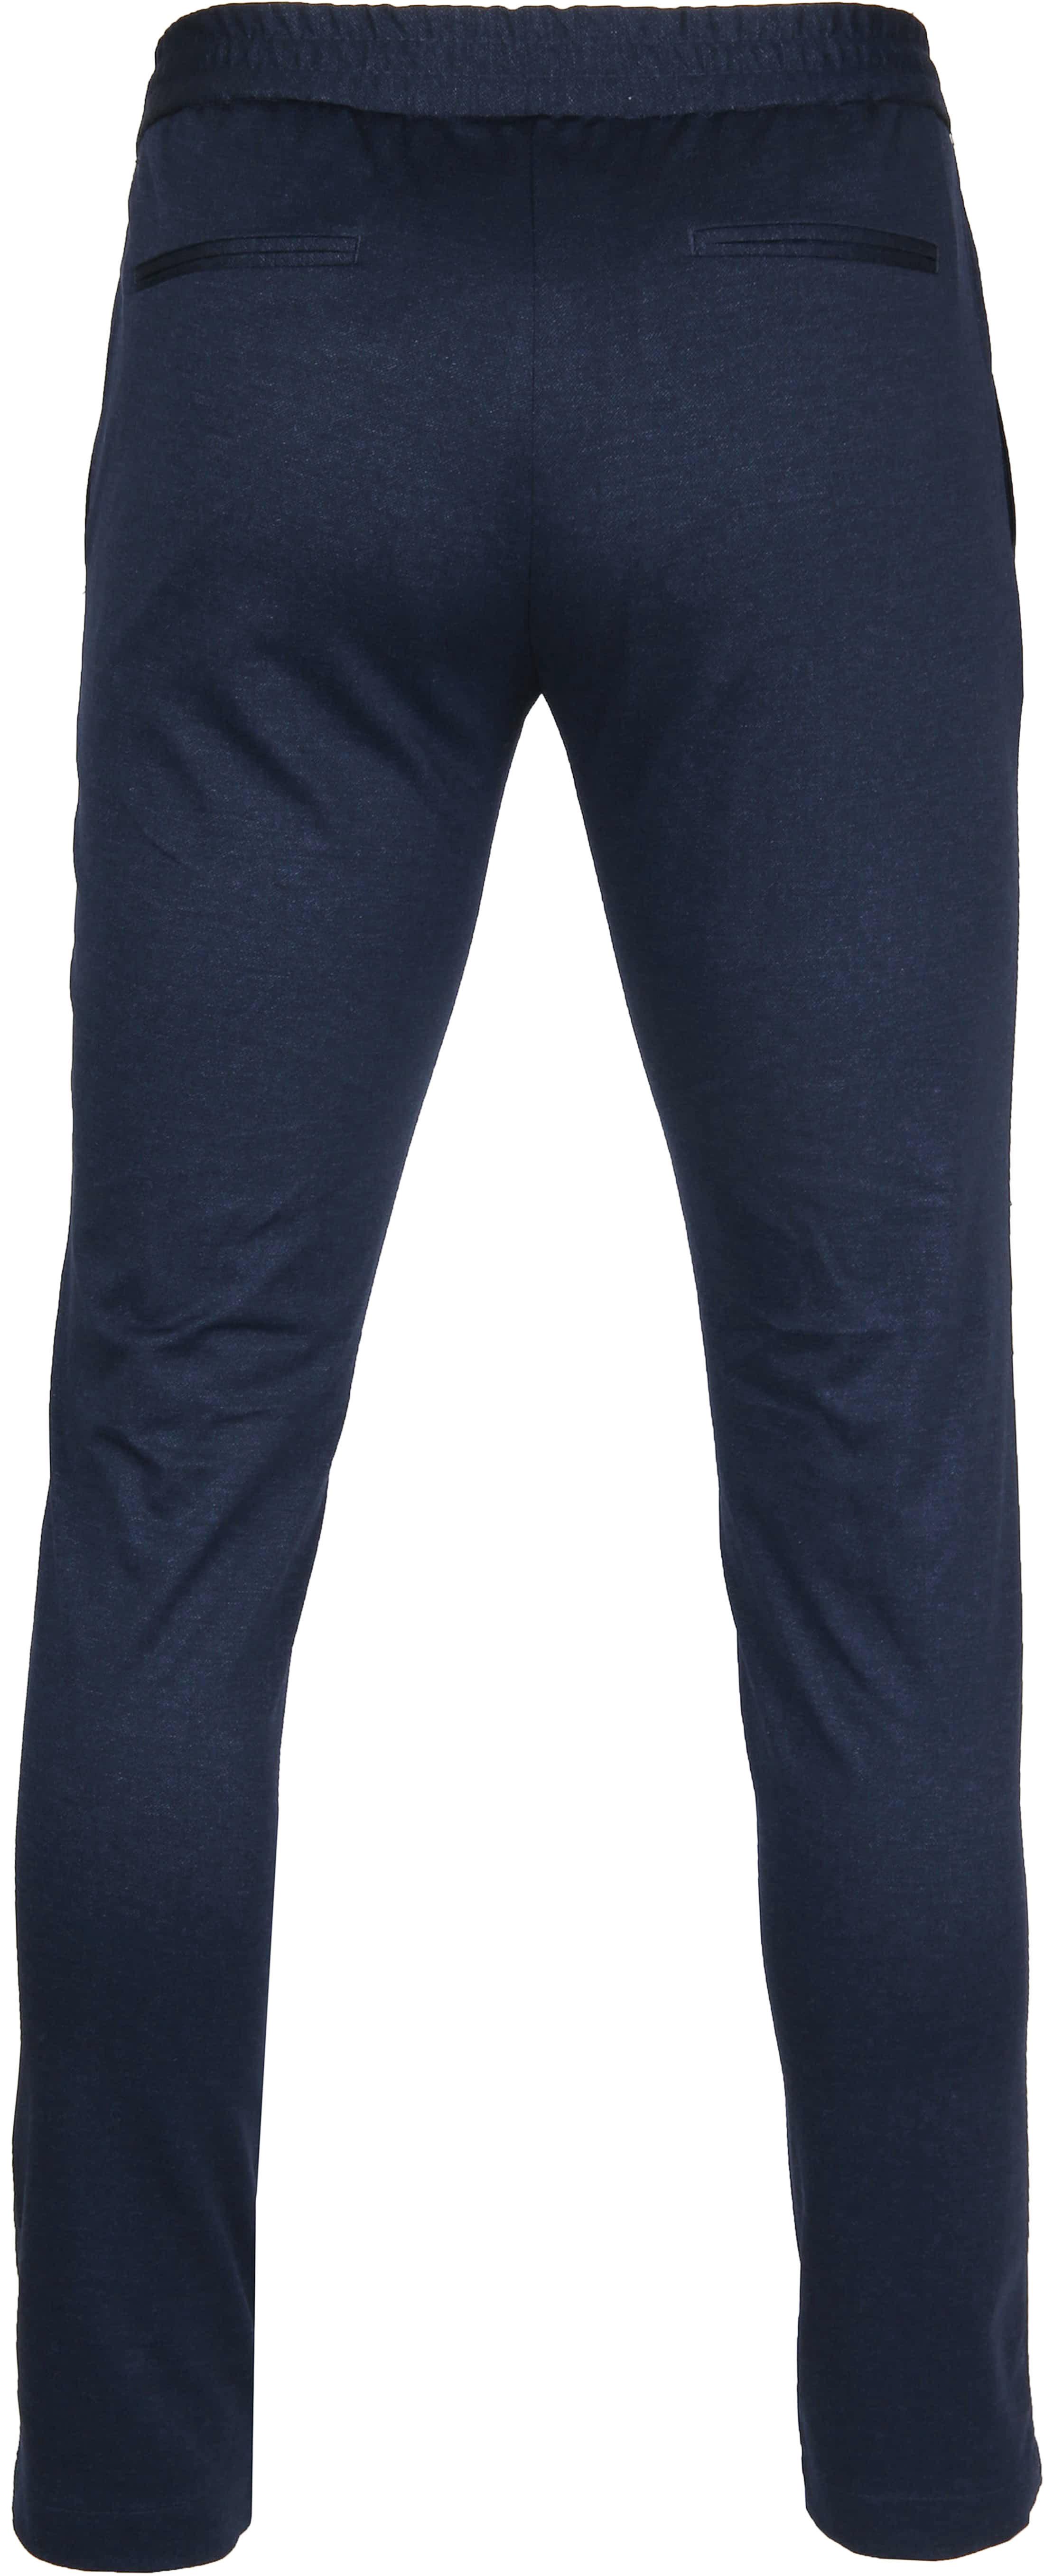 Suitable Jog Pantalon Navy